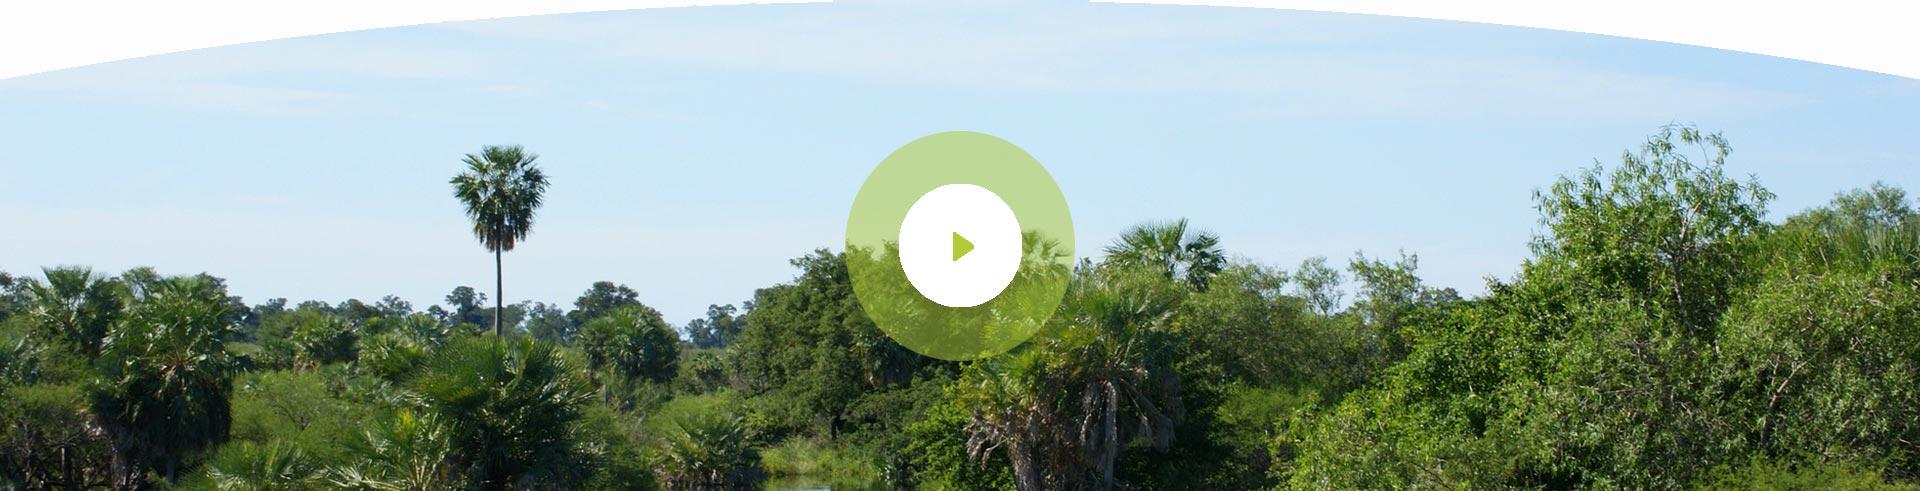 hoverbox-hintergrund-Video-hover